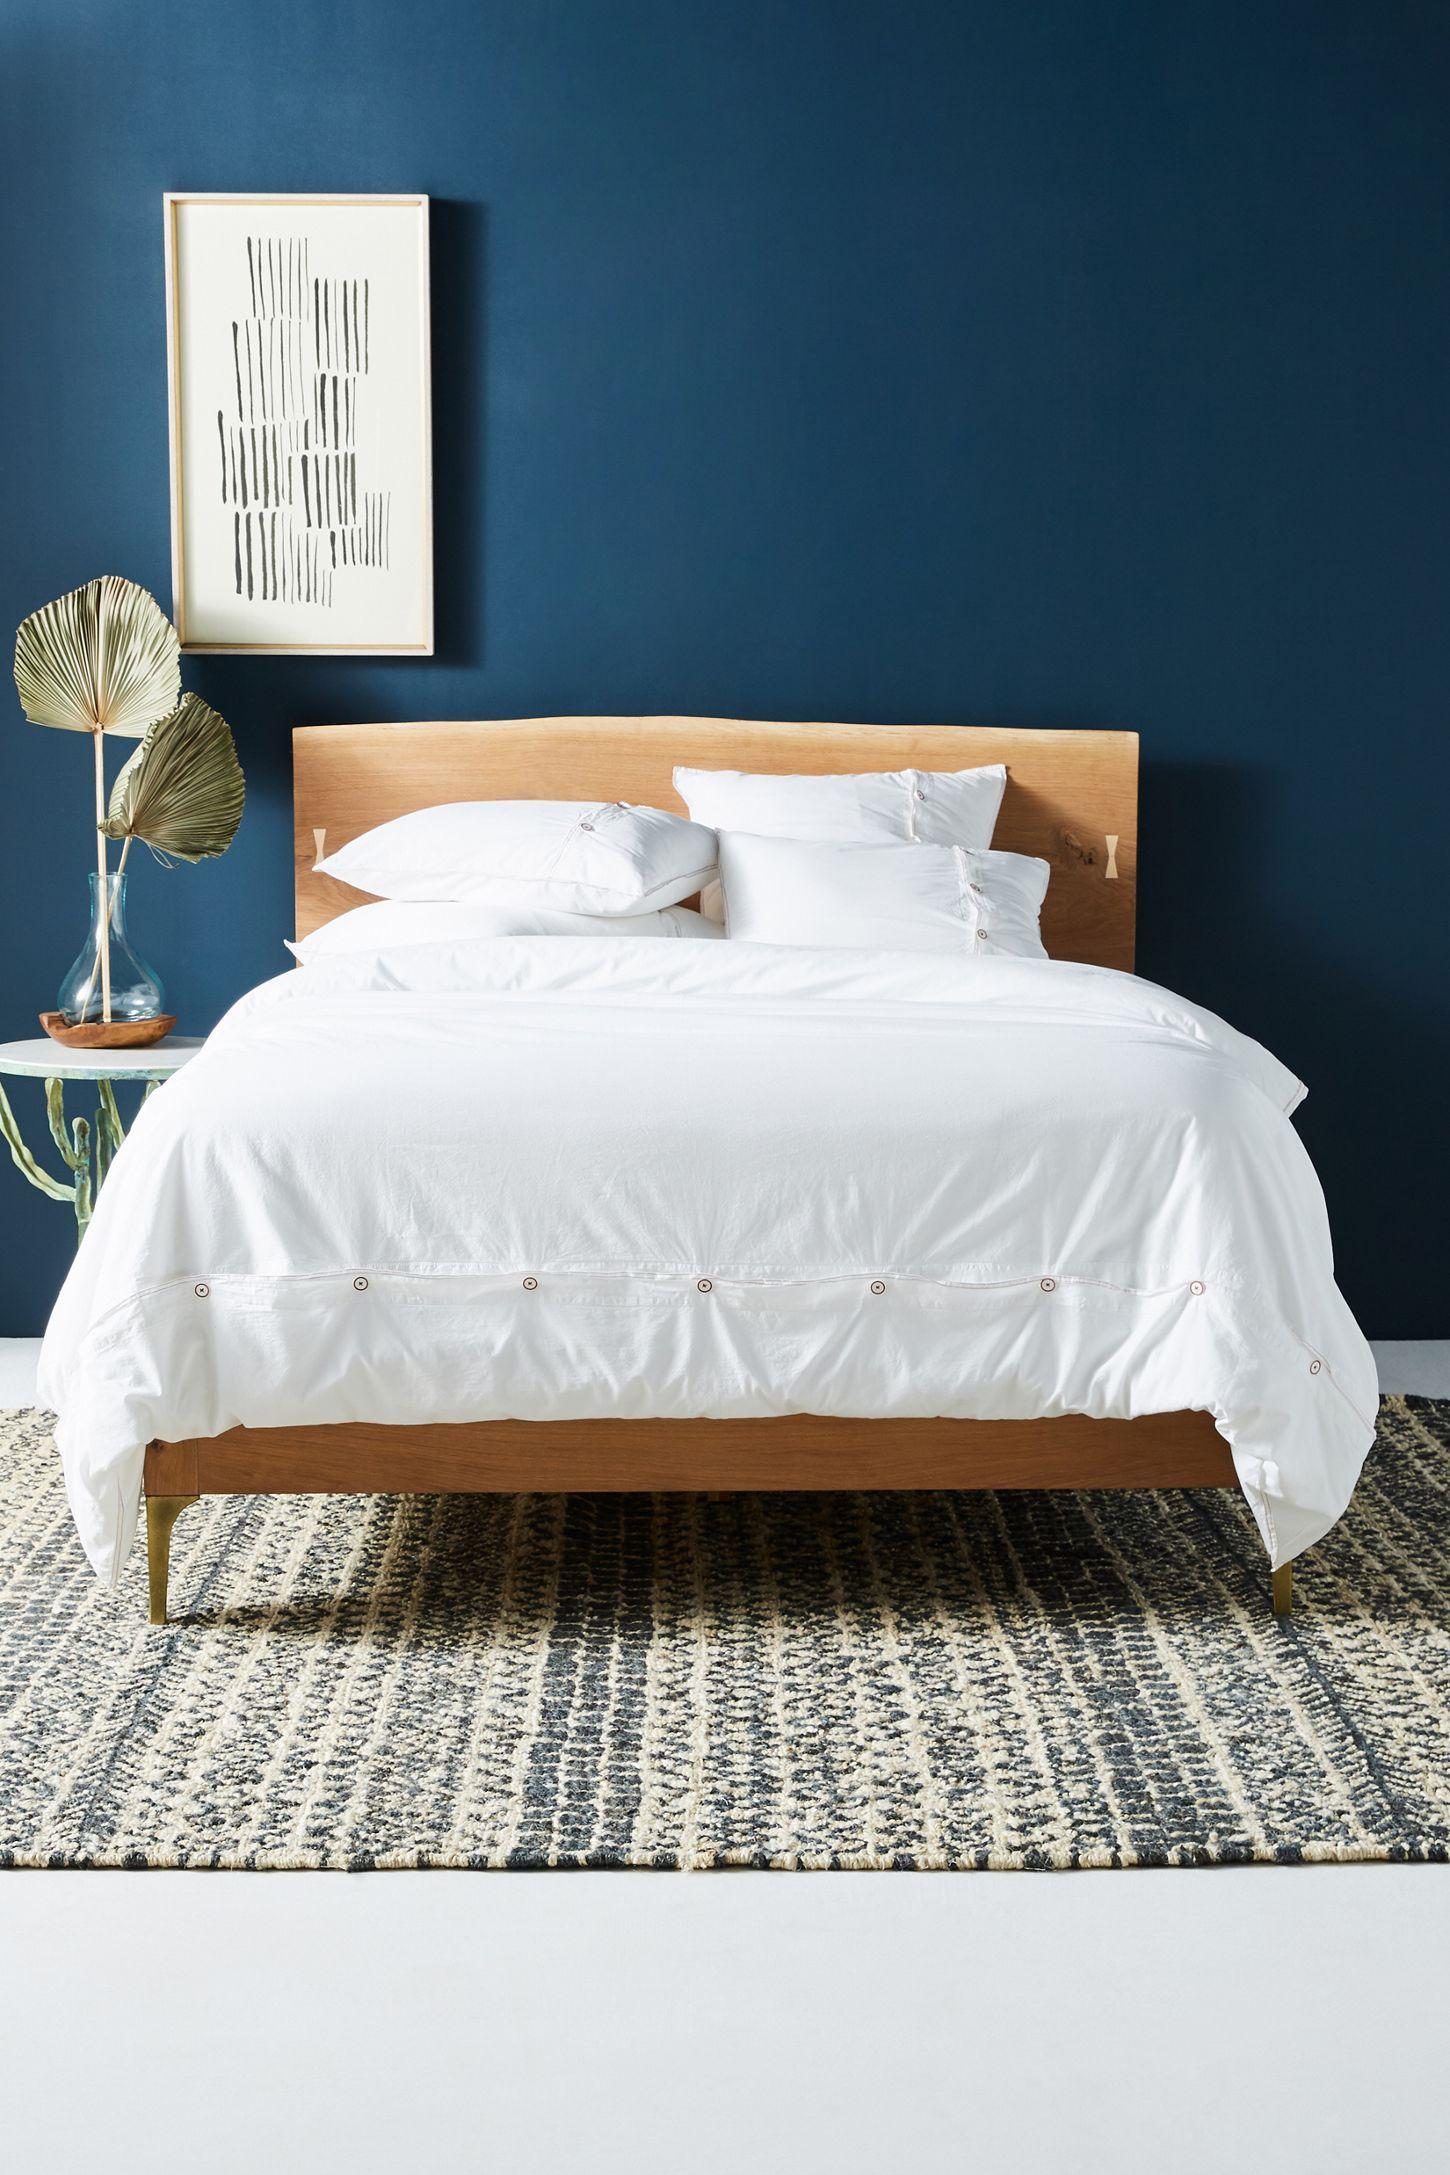 Prana LiveEdge Bed Live edge bed, Unique bedroom